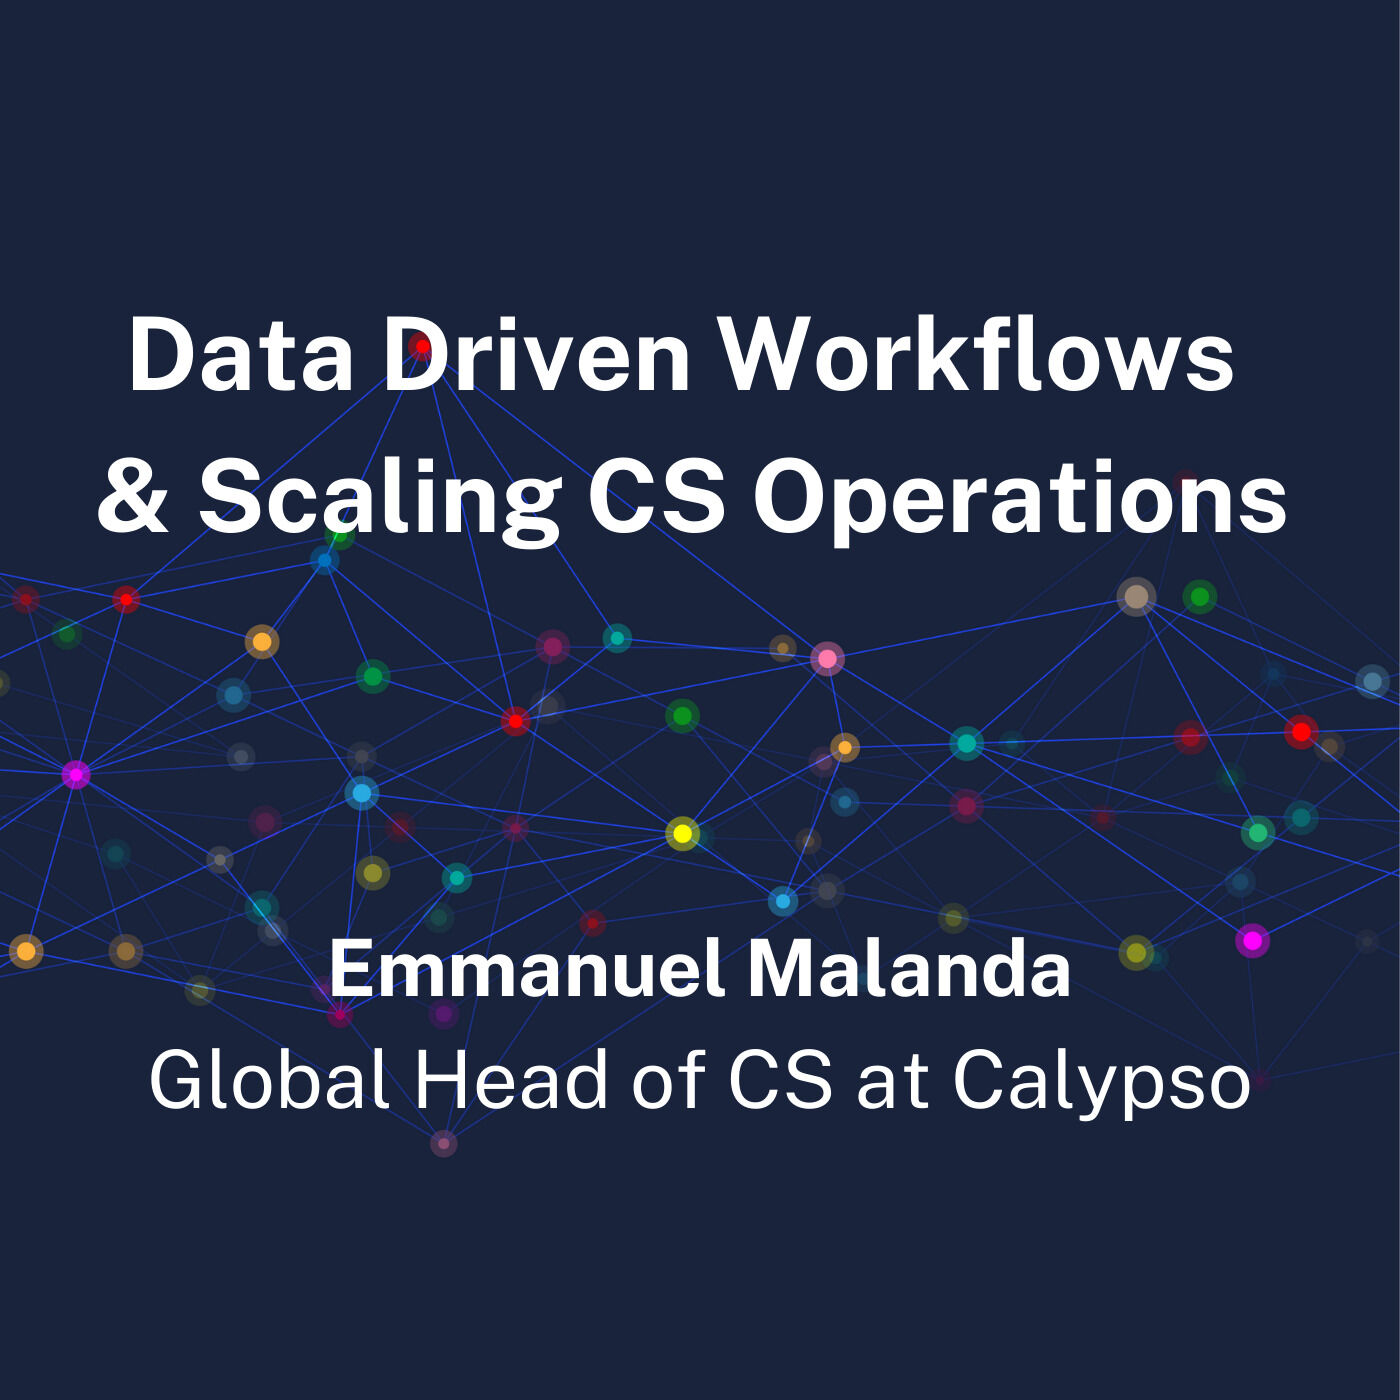 Emmanuel Malanda, Global Head of CS at Calypso - Data Driven Workflows & Scaling CS Operations